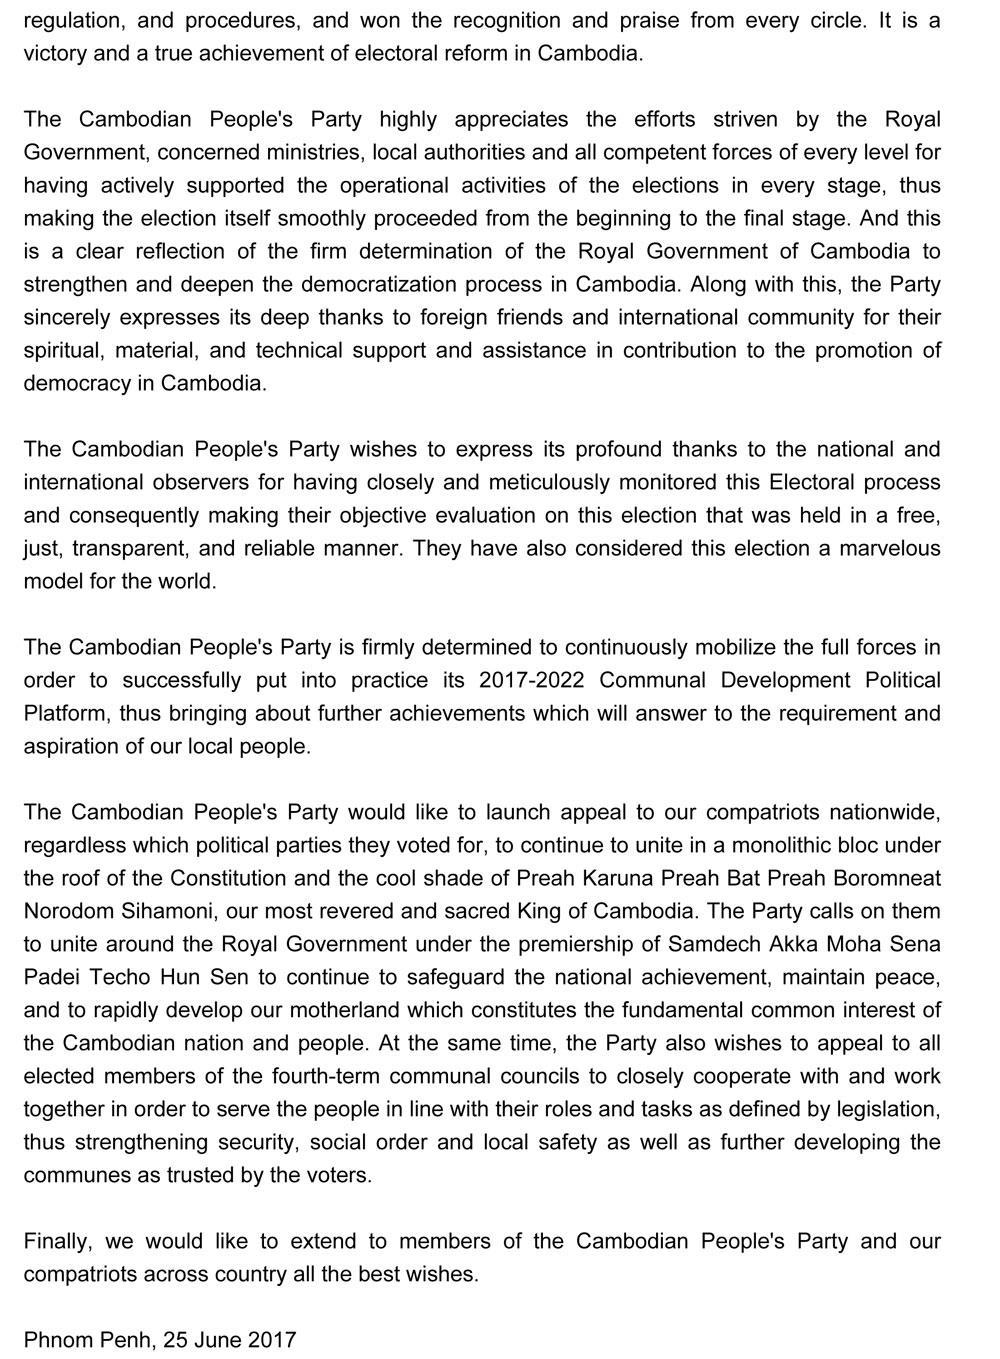 Cover letter for fresher lecturer job application image 3